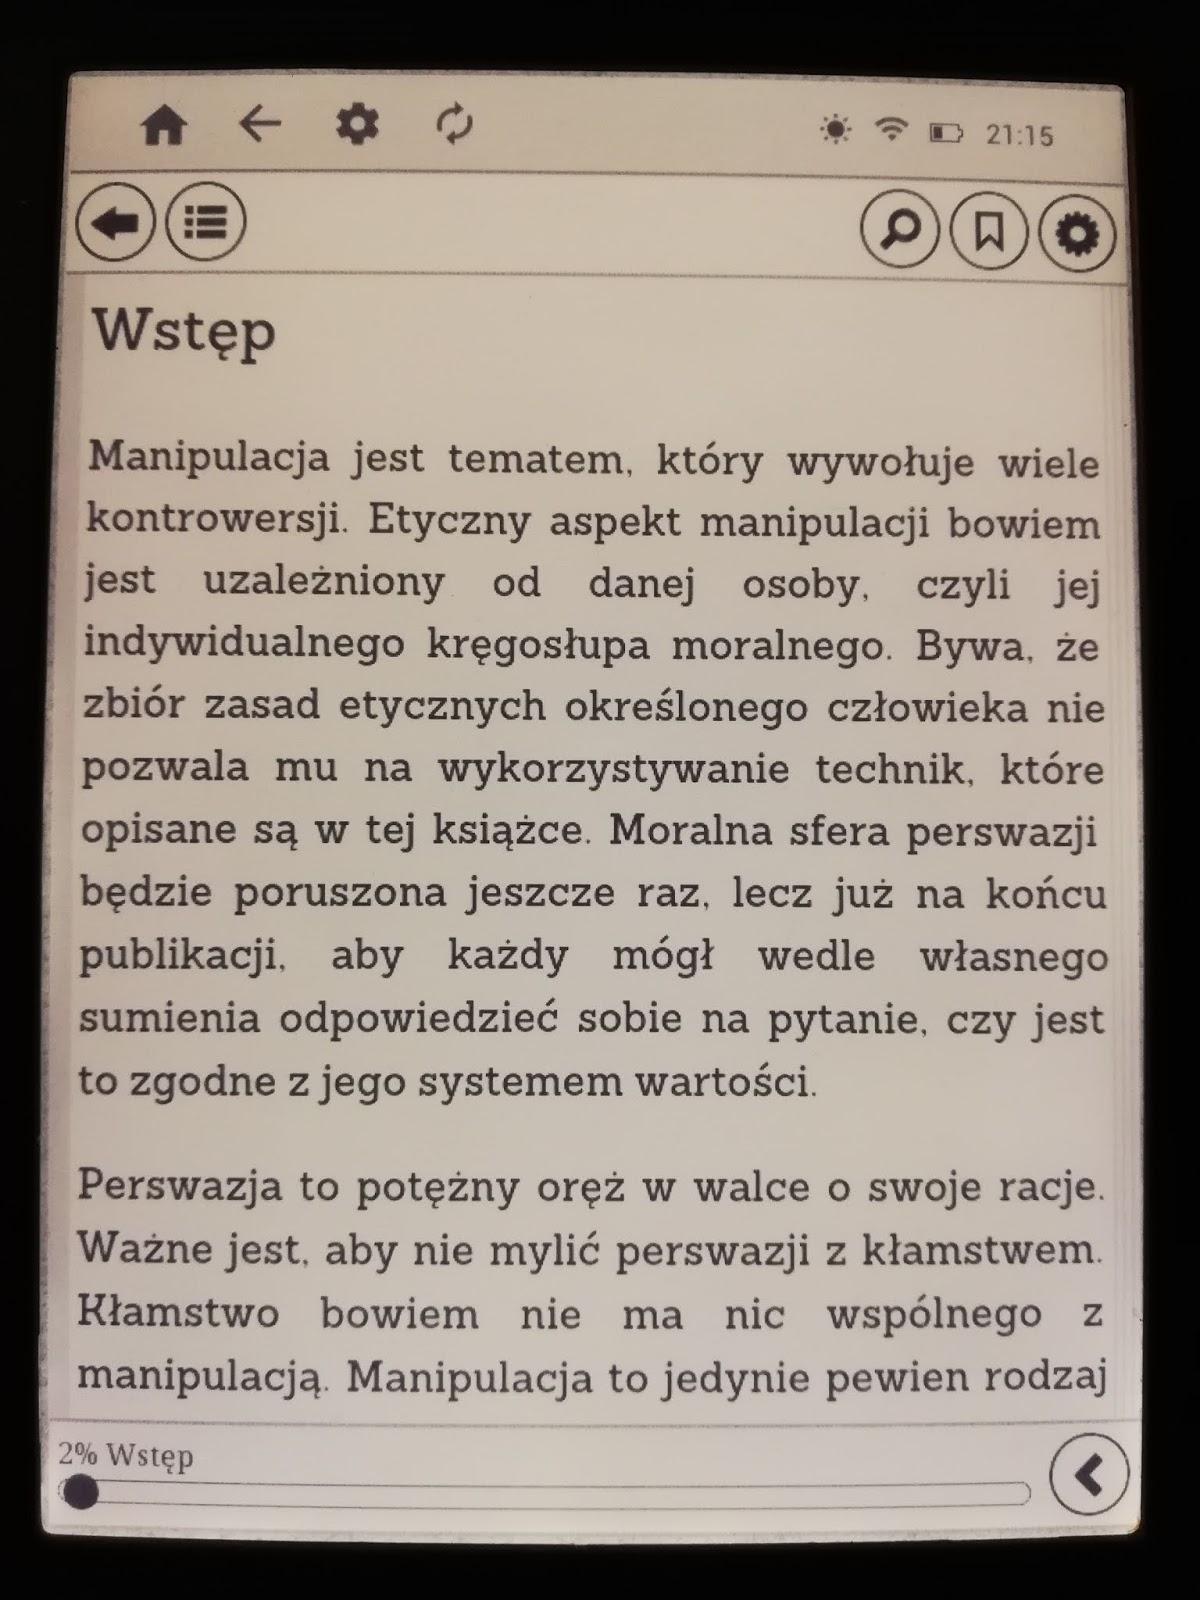 InkBOOK LUMOS – menu e-booka w aplikacji Legimi ebooks